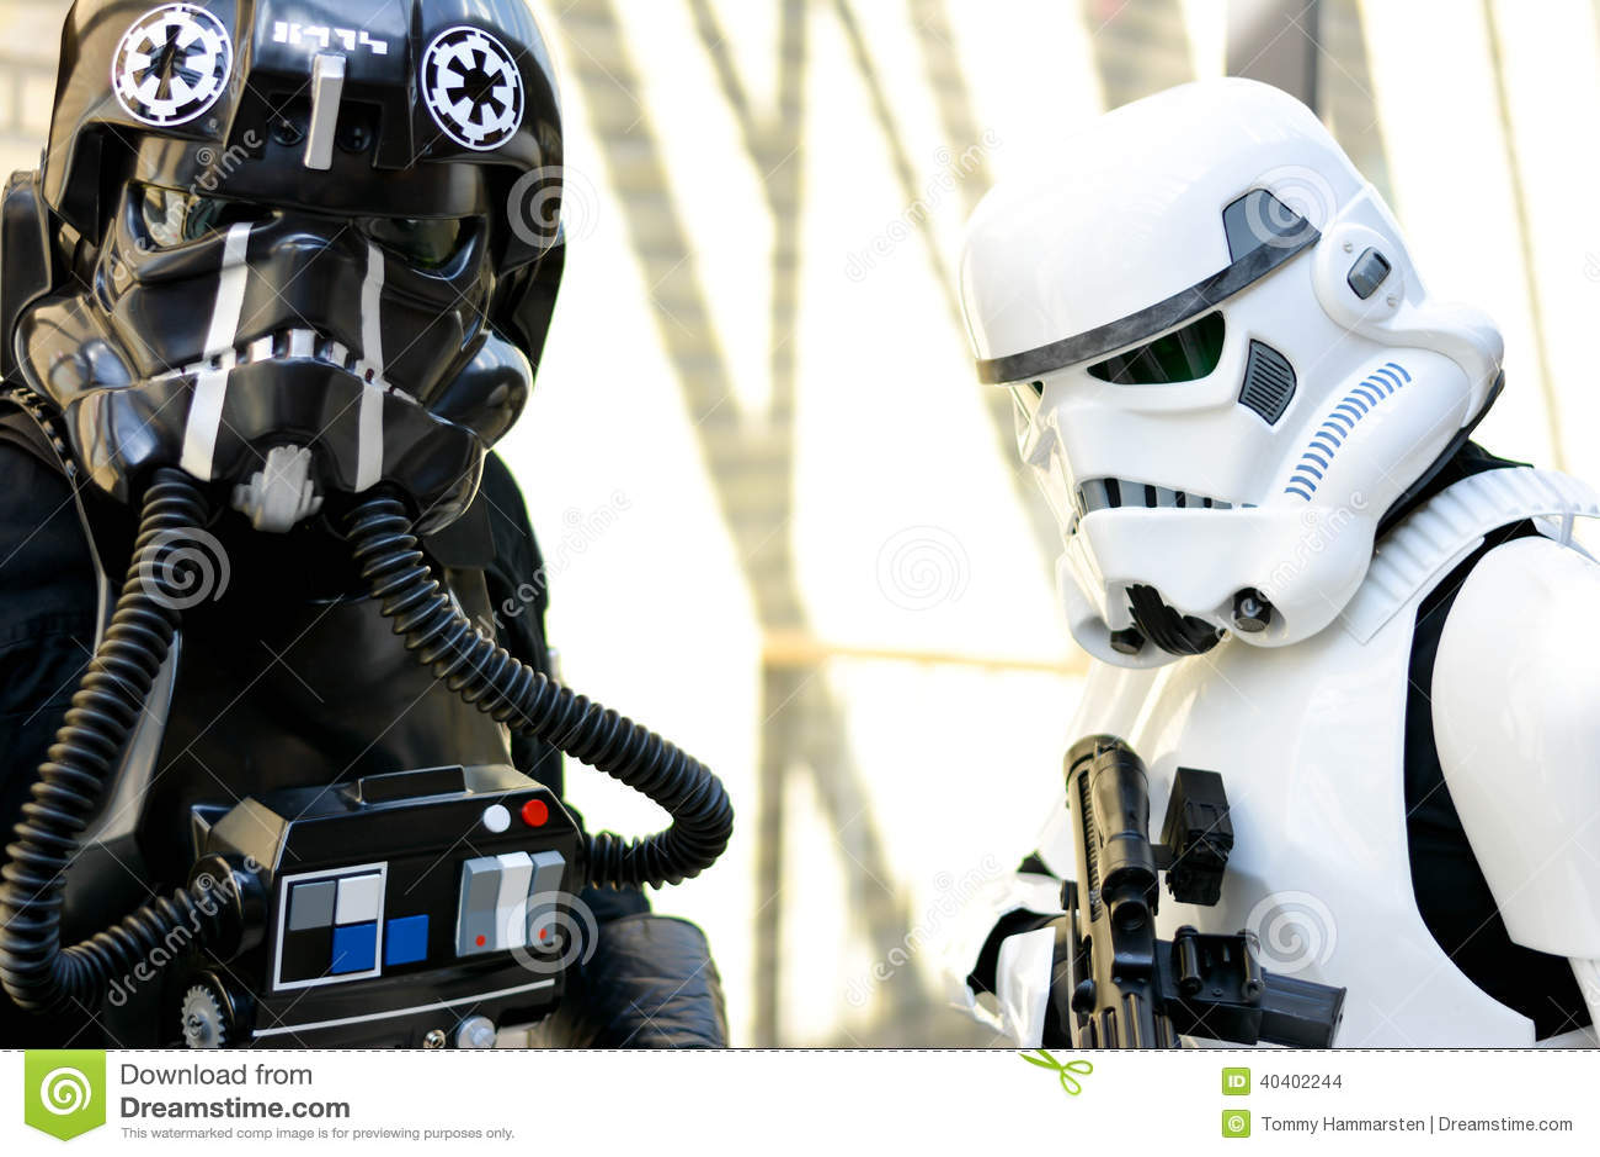 Stormtroopers Звездных войн